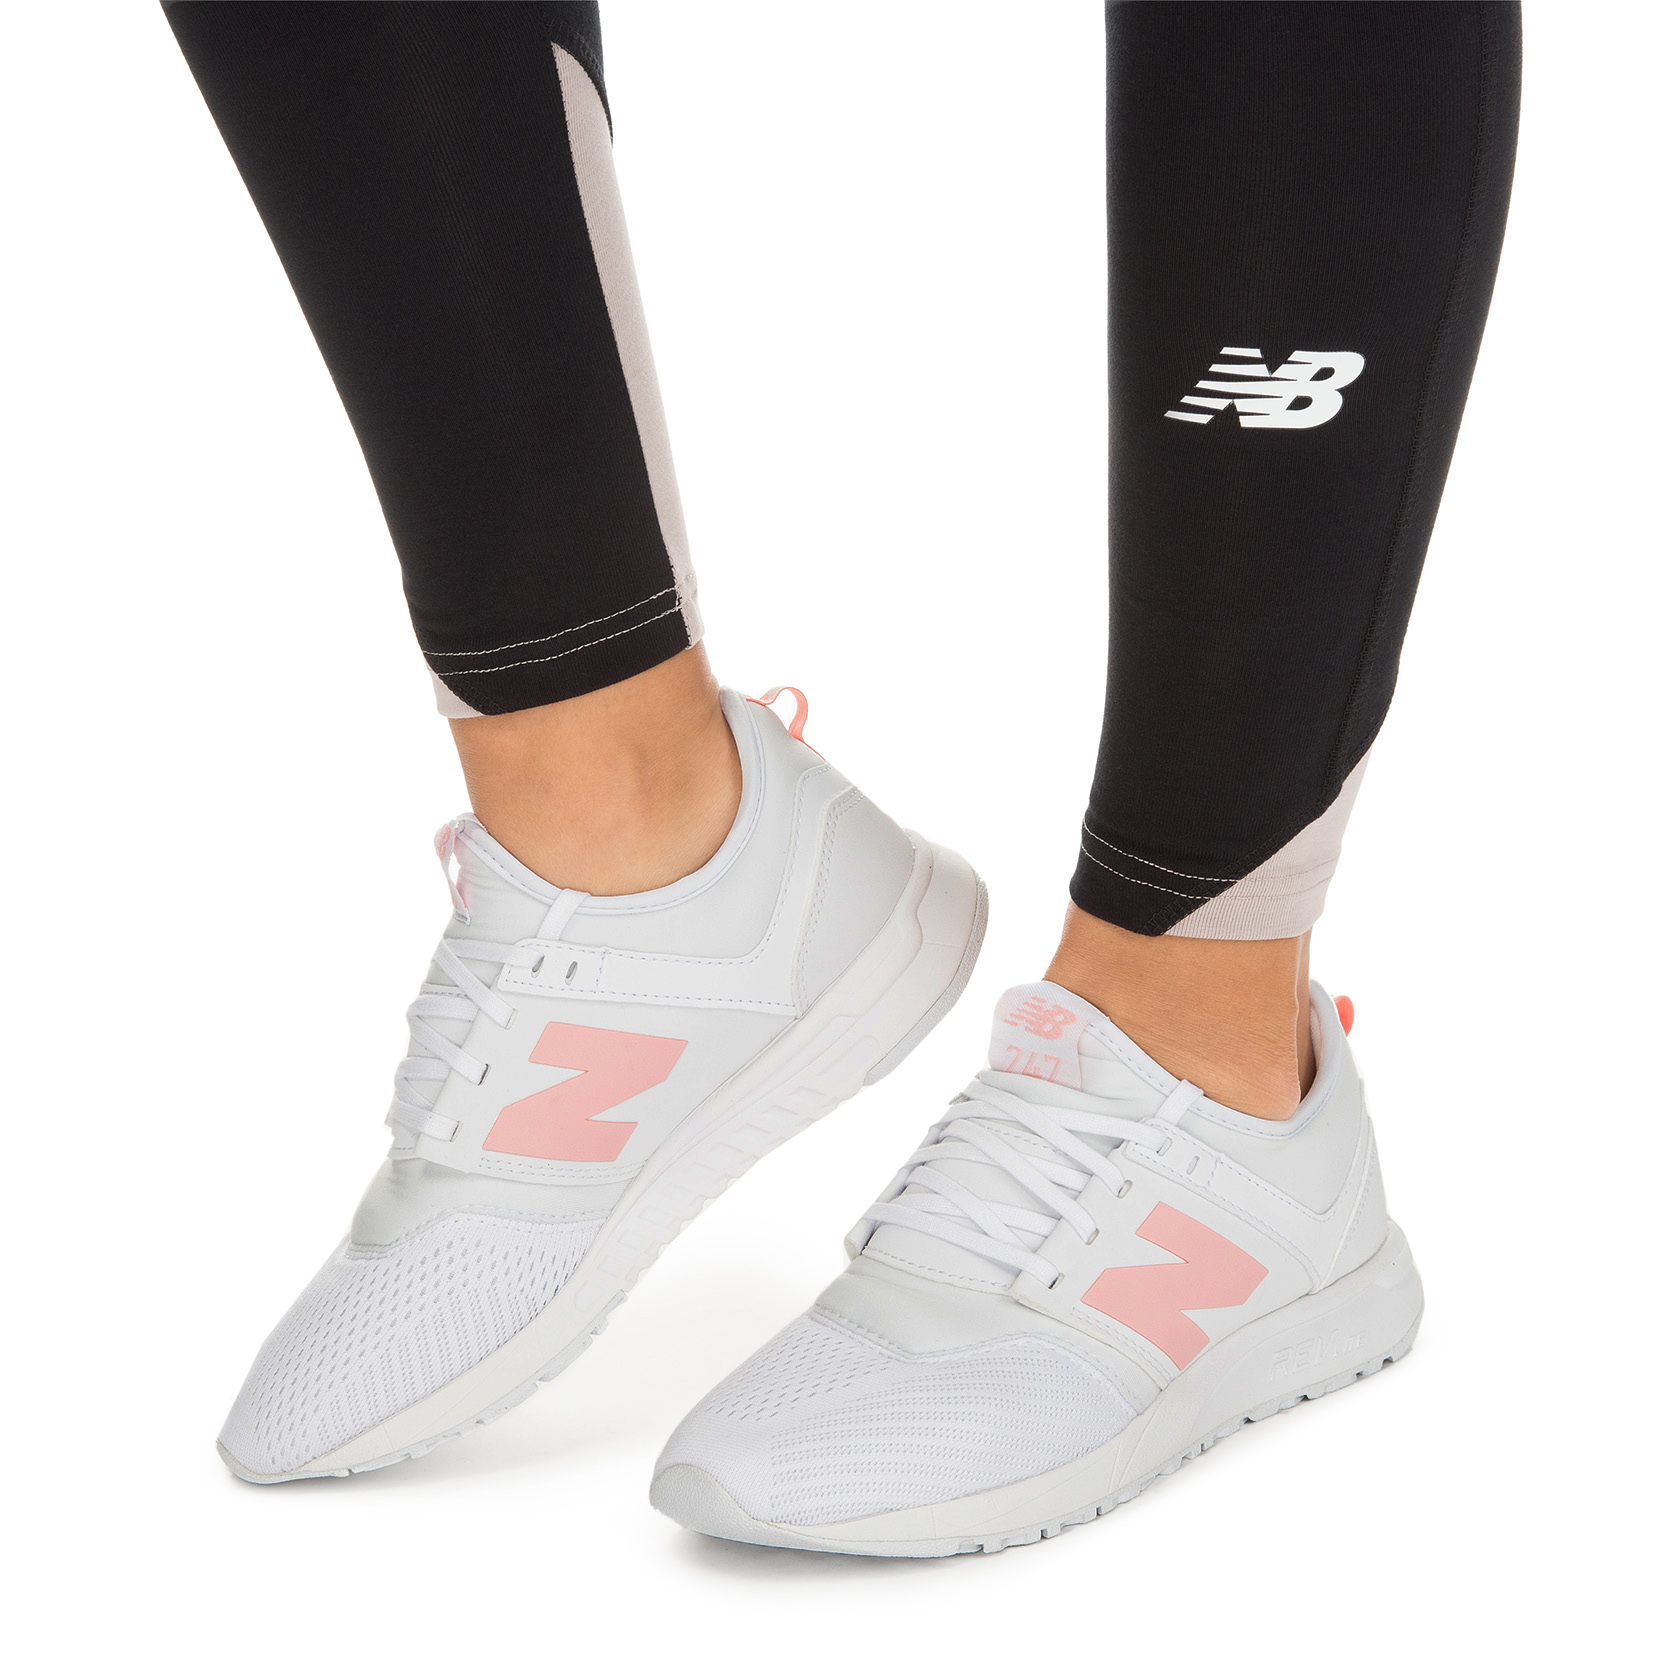 Жіноче взуття повсякденне New Balance 247v1 WRL247EN | New Balance